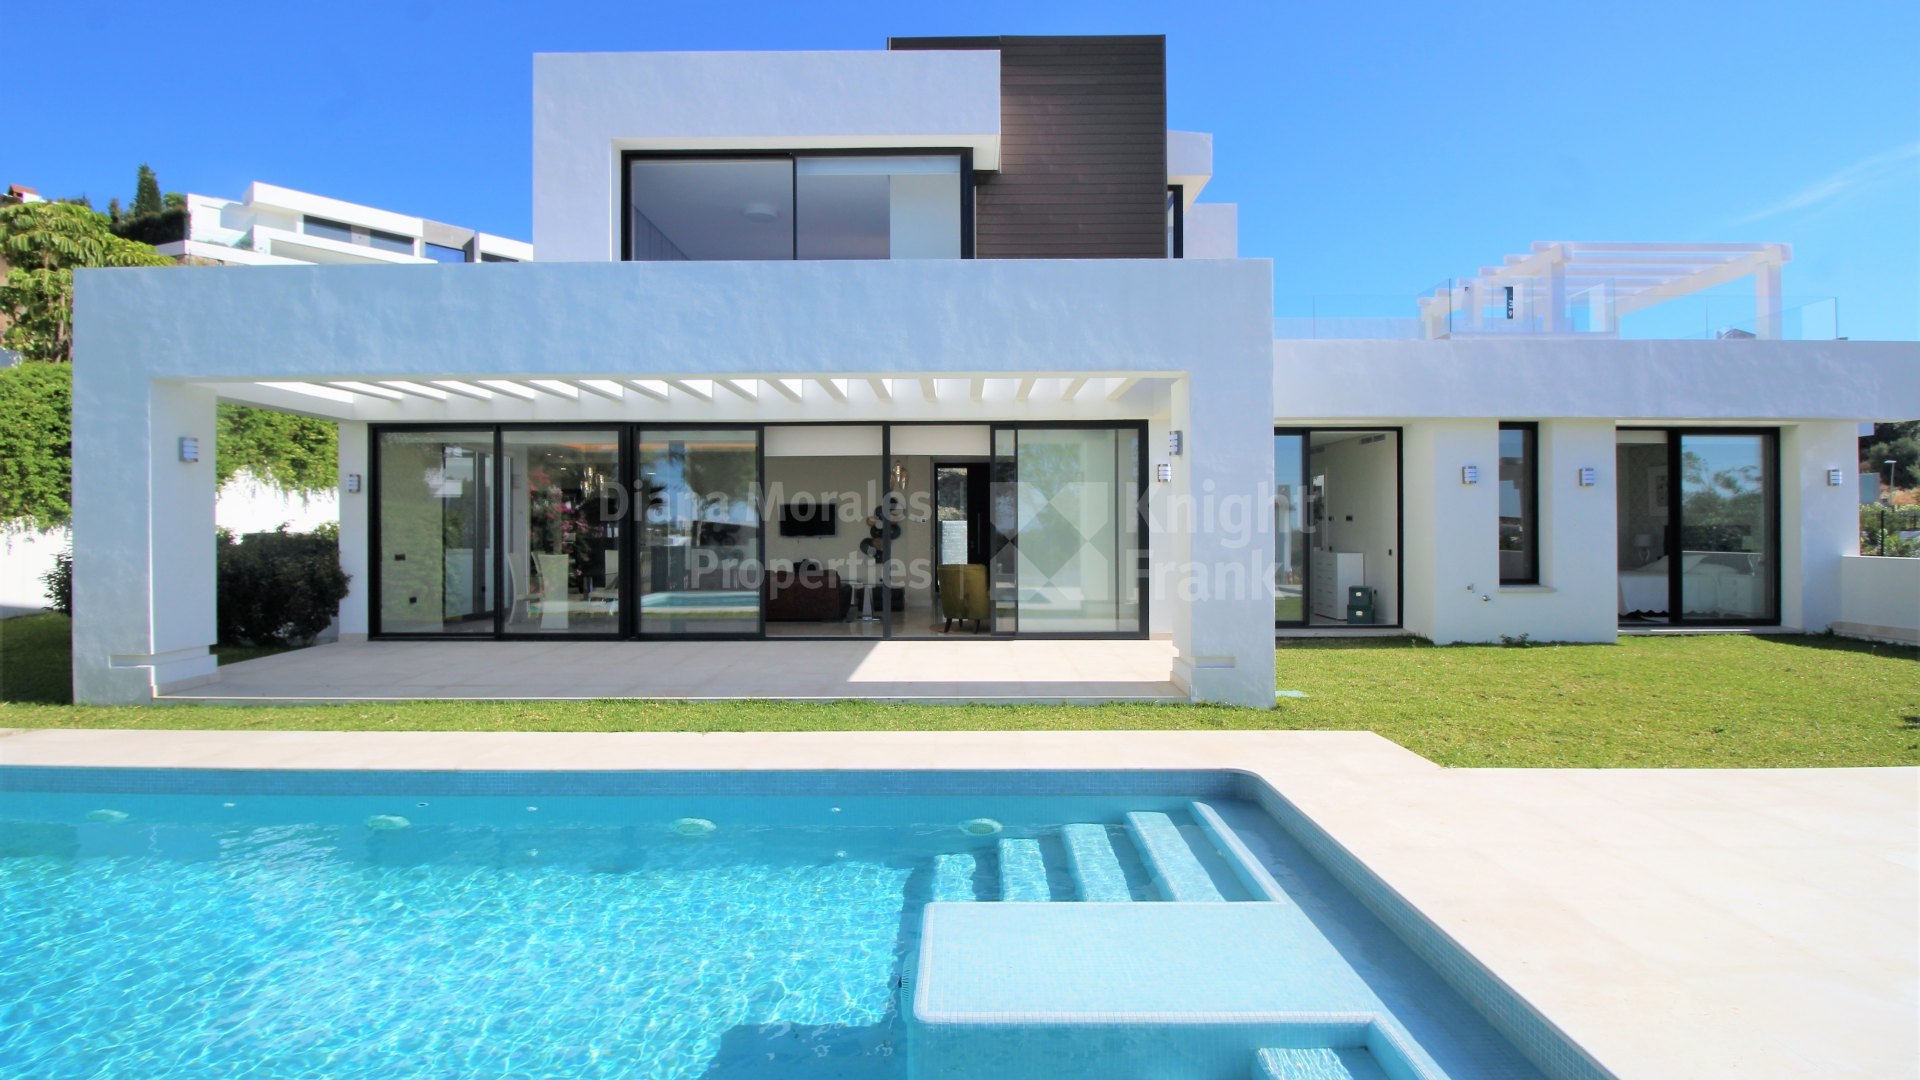 Capanes sur newly built contemporary villa